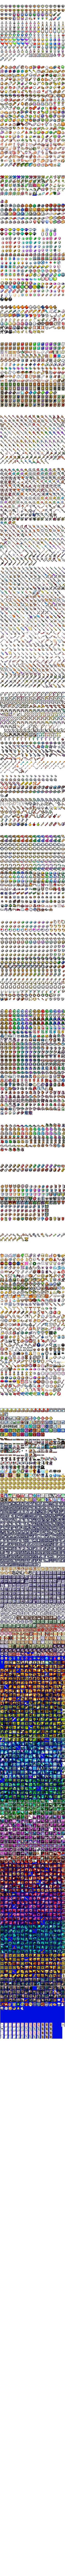 MEGA Icon set (+/- 5000) 157150IconSet